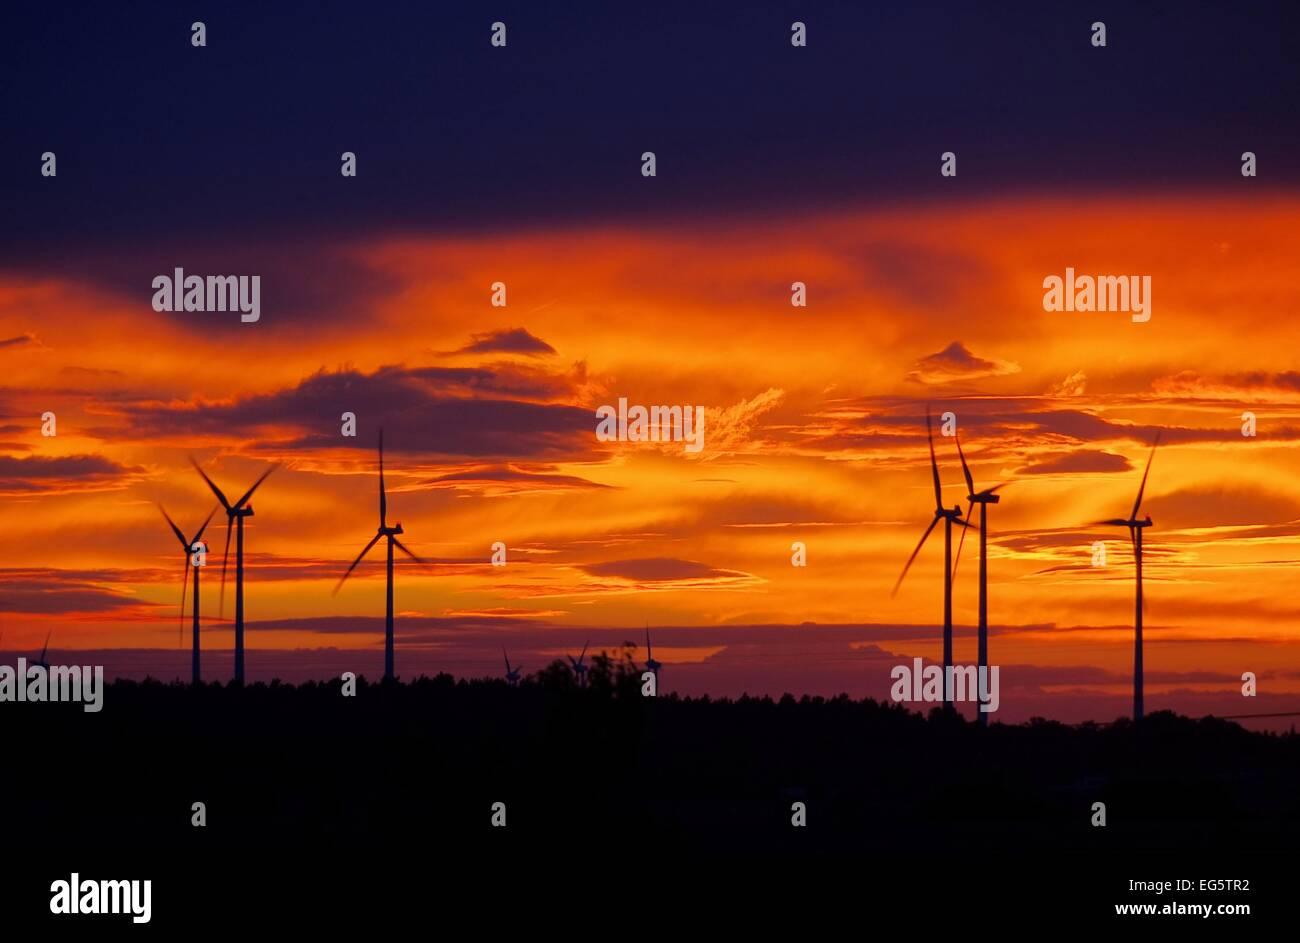 Windrad Sonnenuntergang - Windkraftanlage Sonnenuntergang 01 Stockbild